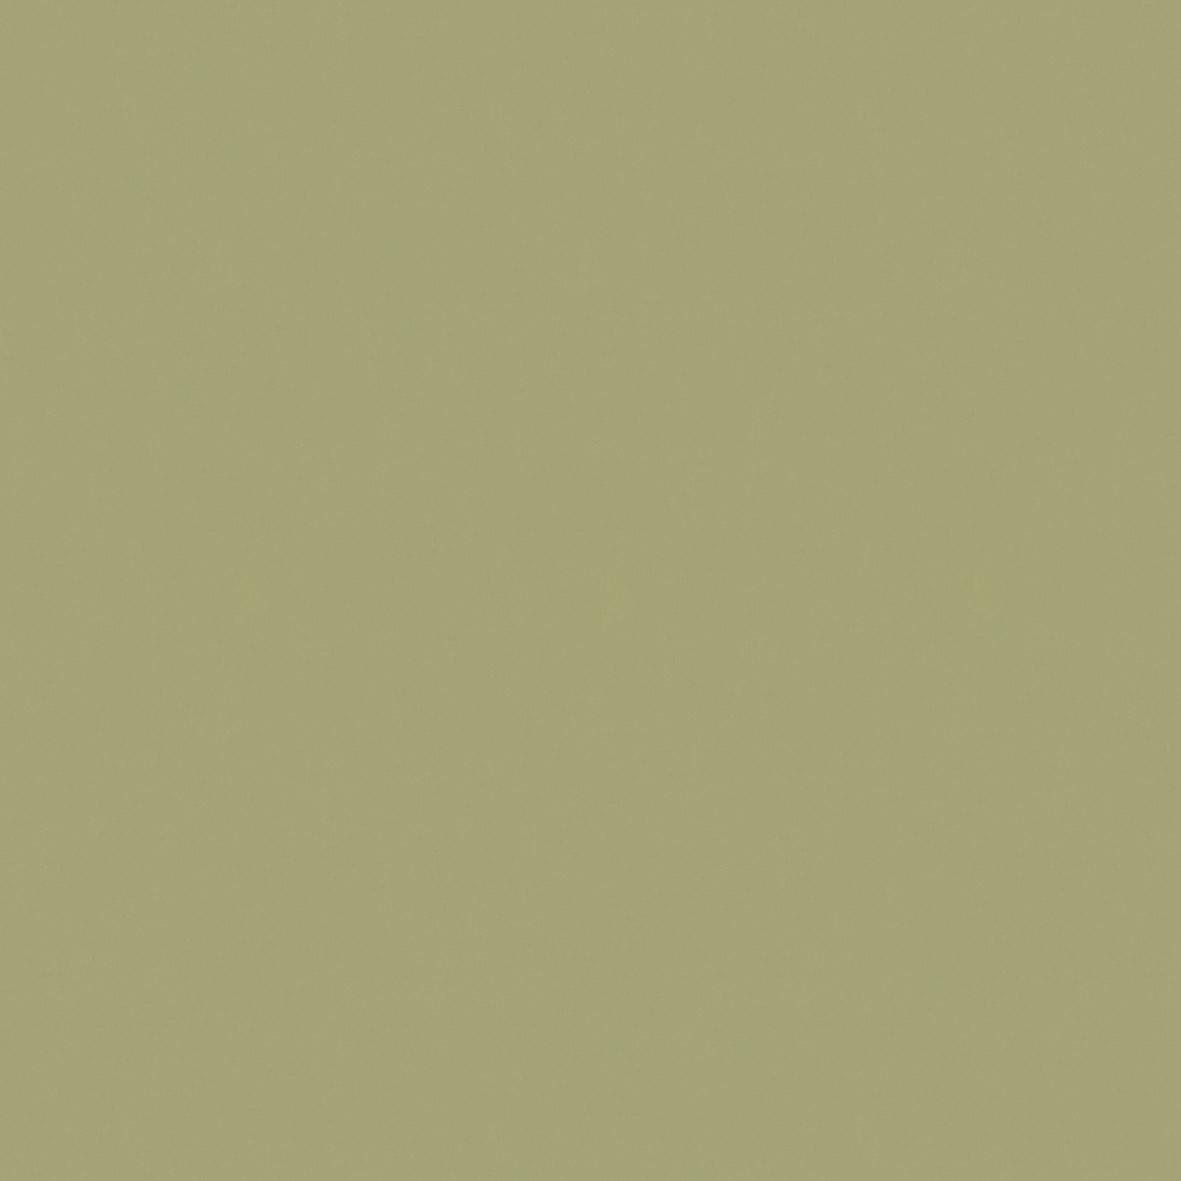 Roller_Swatch_Banlight_Duo_FR_Green_RE03318